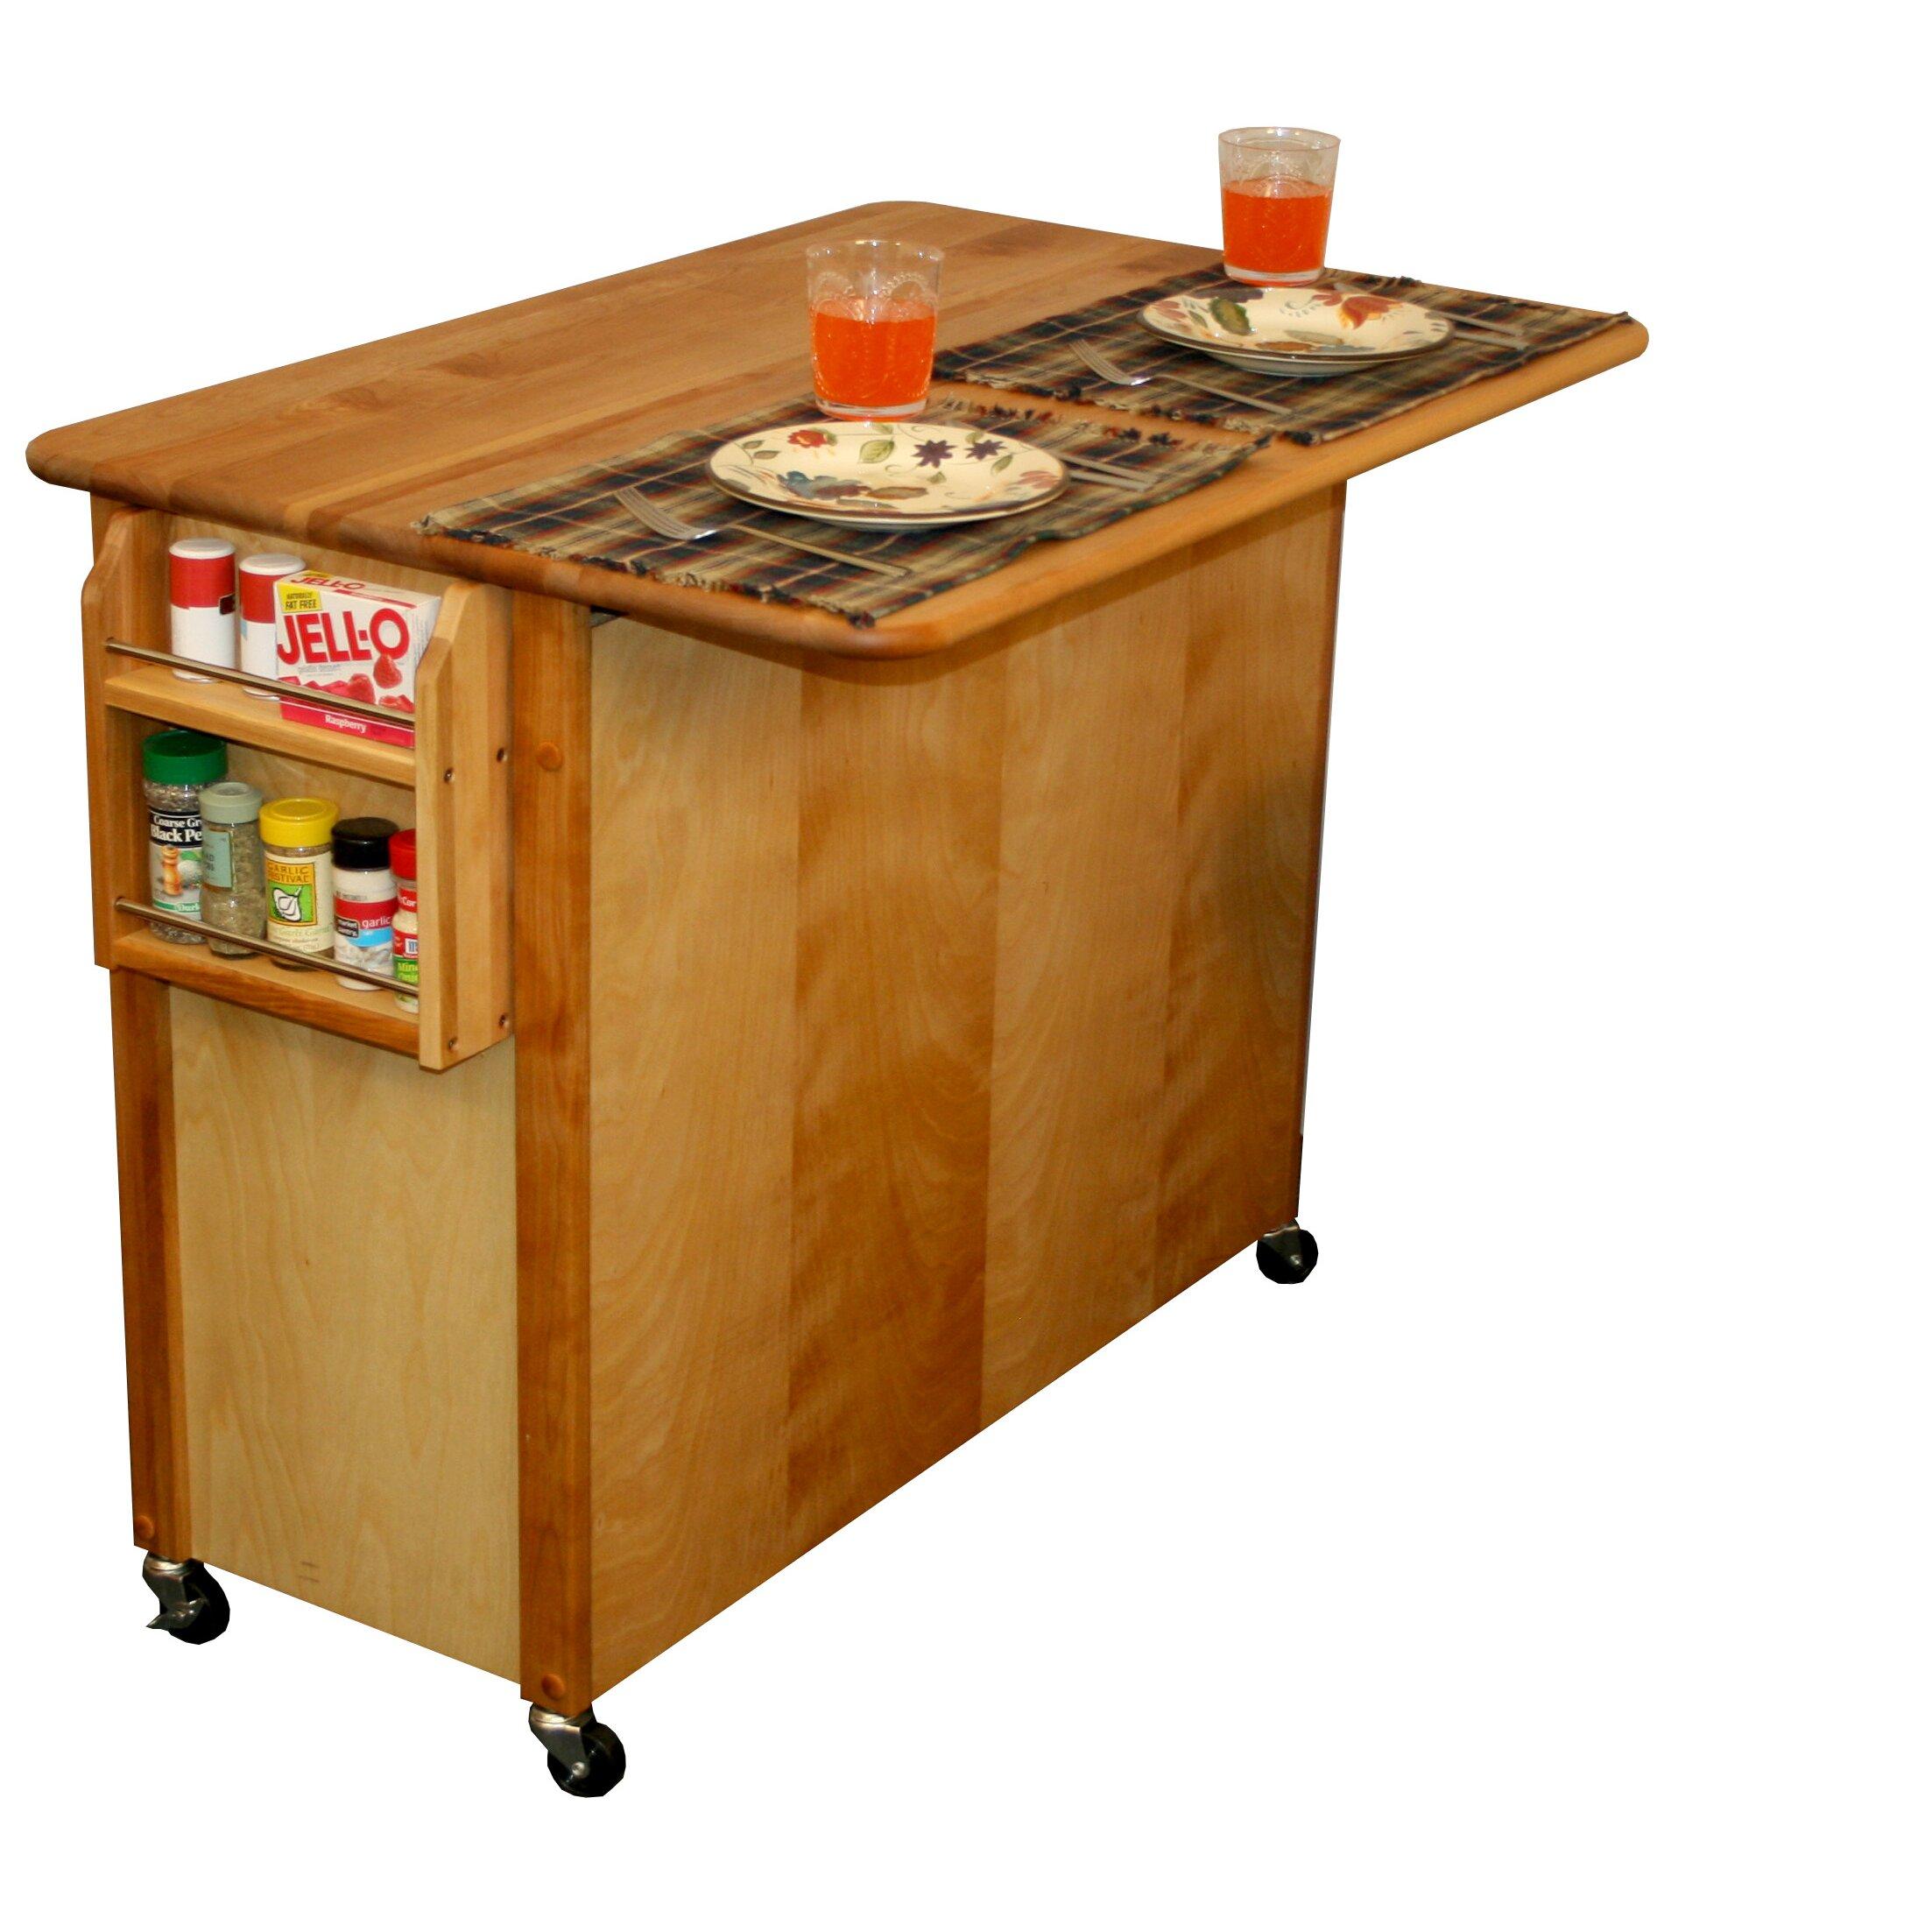 catskill craftsmen kitchen island amp reviews wayfair catskill craftsmen kitchen island with butcher block top